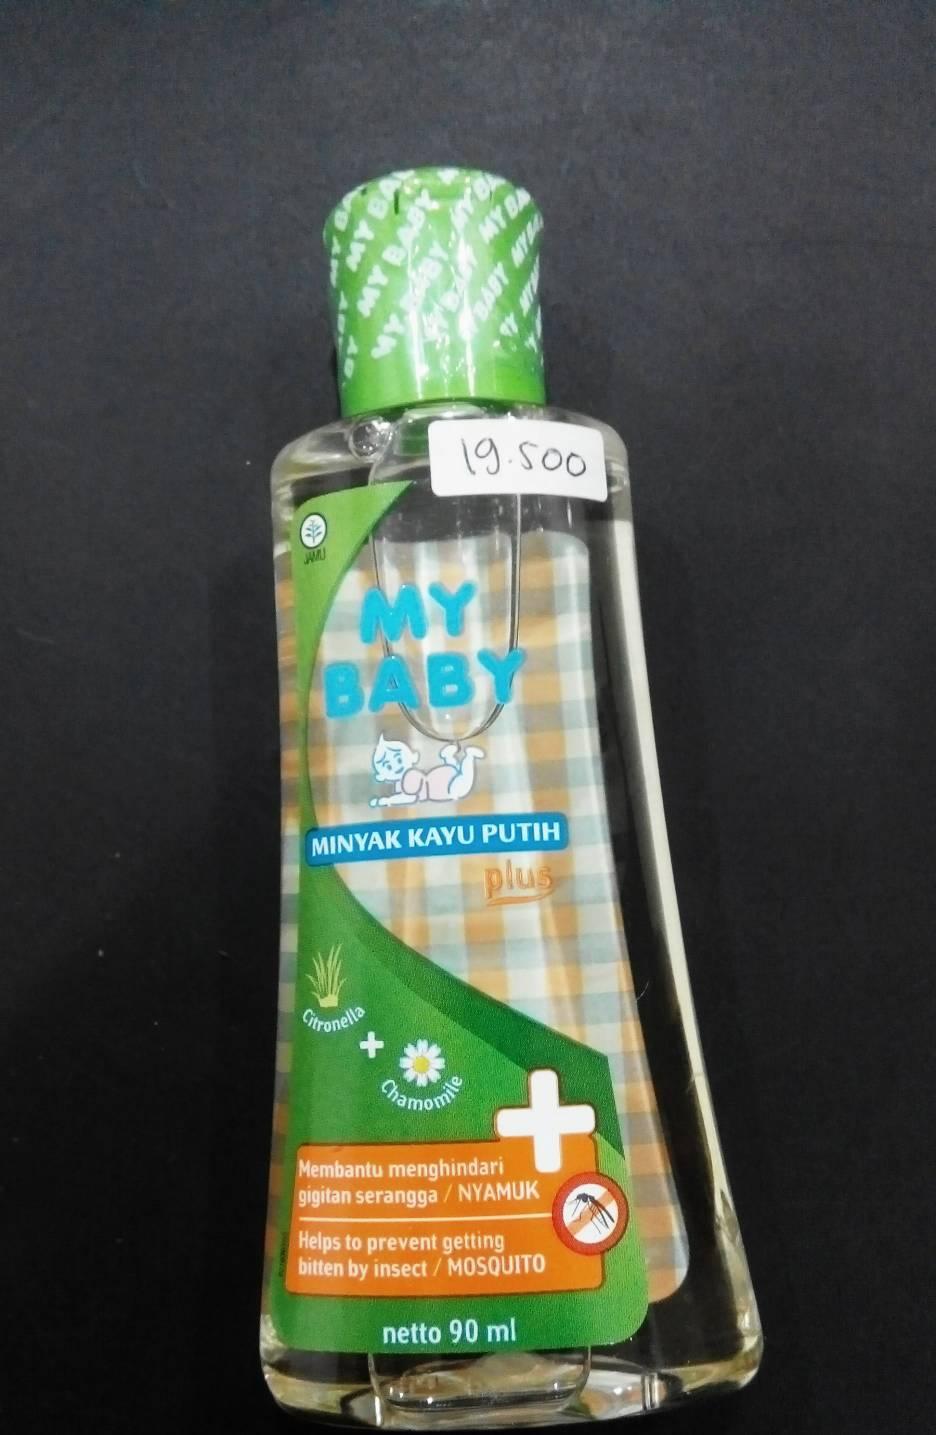 Jual Minyak Kayu Putih Plus My Baby 90 Ml 90ml Bayiraras Tokopedia Telon 150